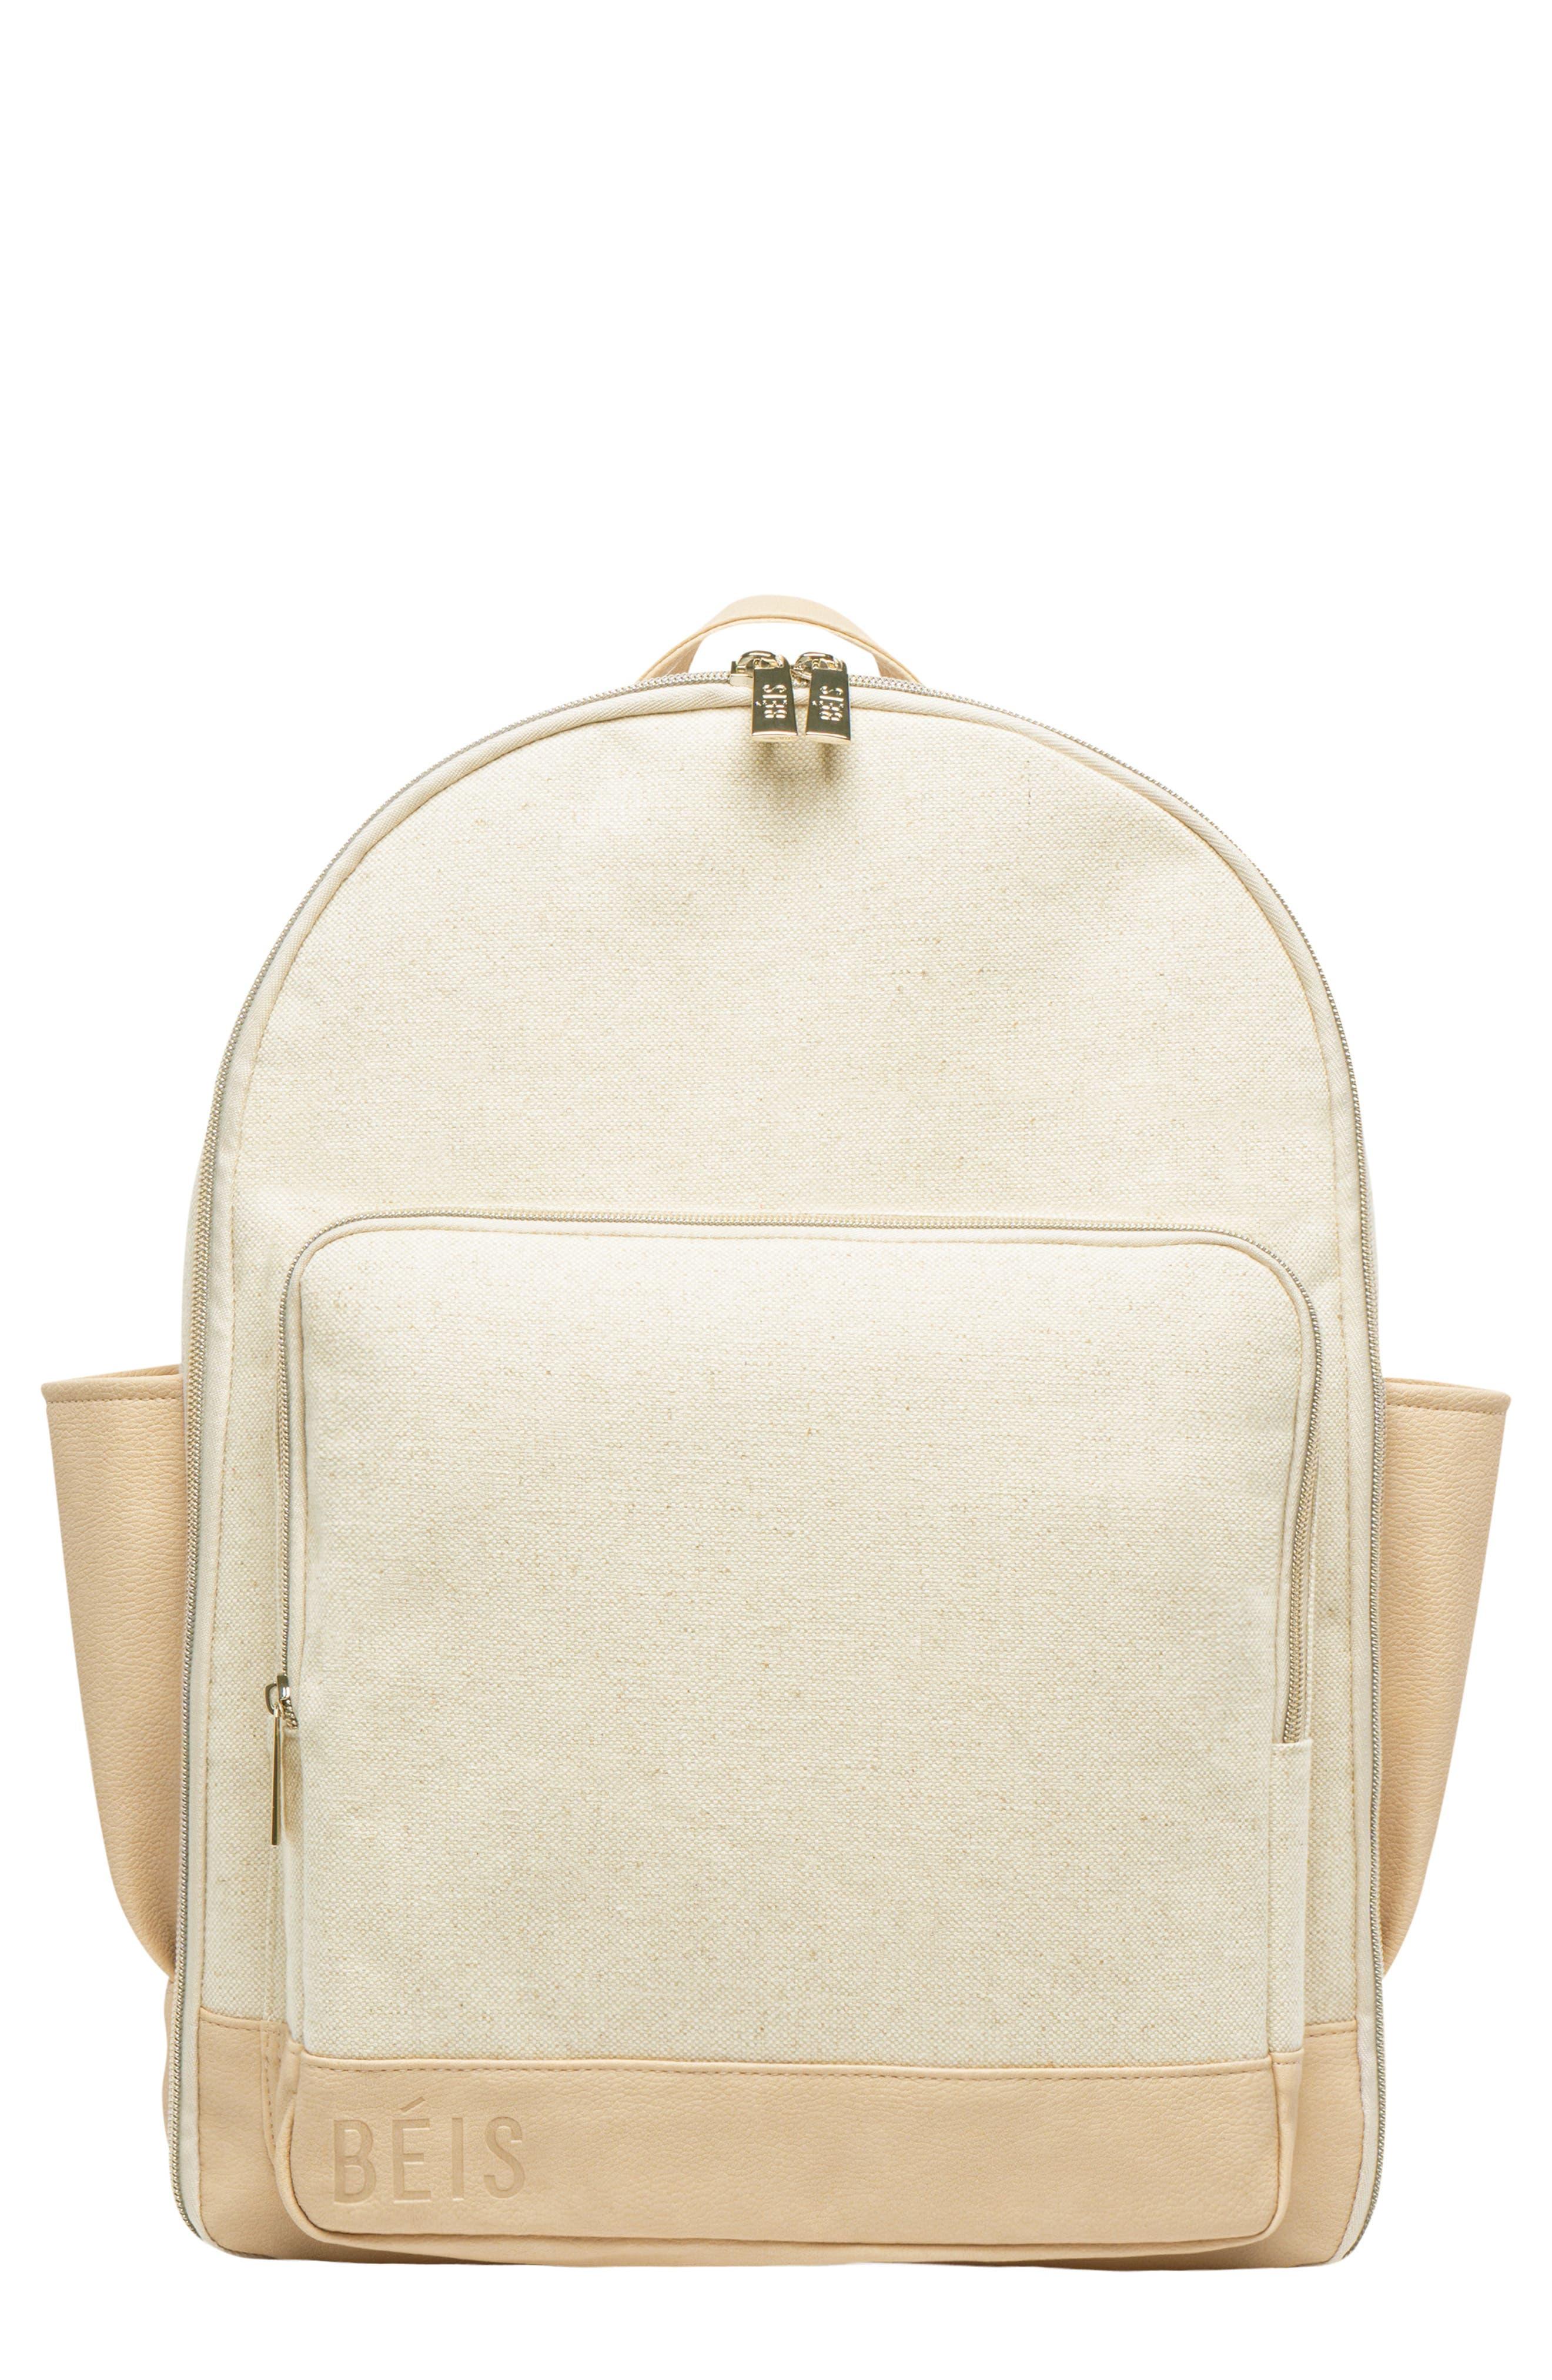 Beis Travel Multi Function Travel Backpack -